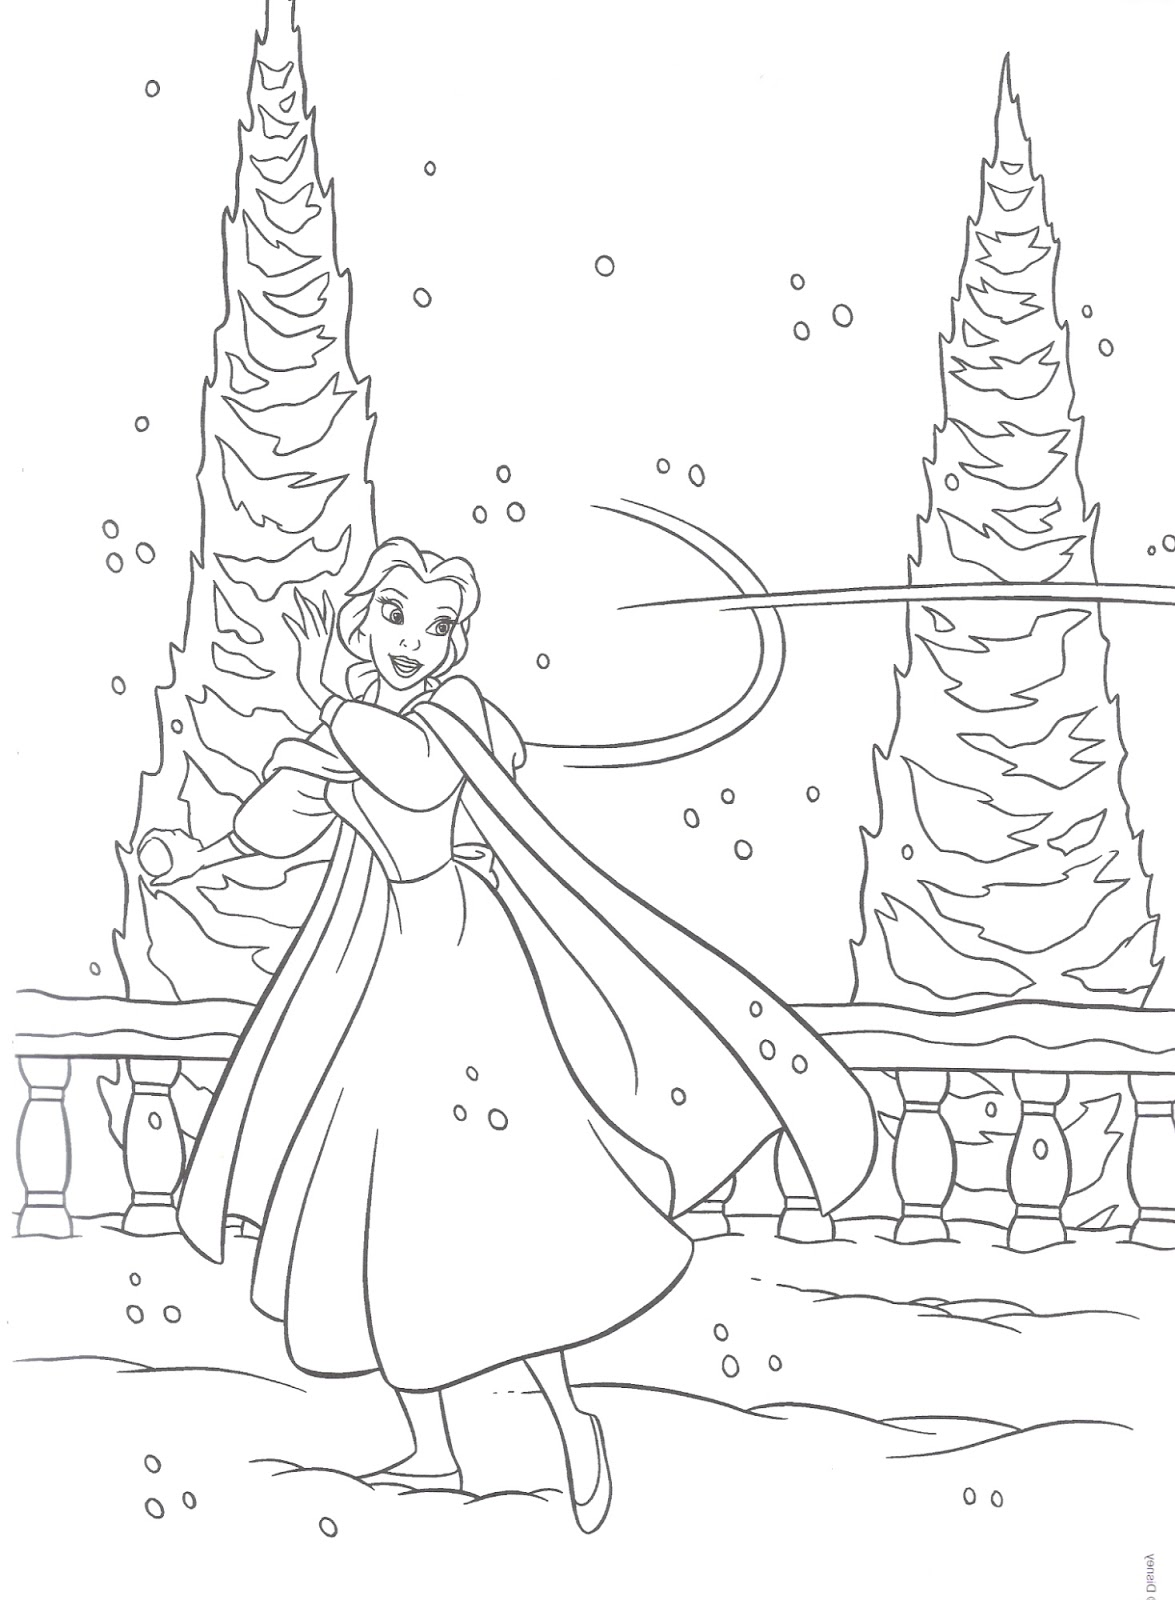 Princesas Disney: Dibujos para colorear - Princesas Disney (Navidad)